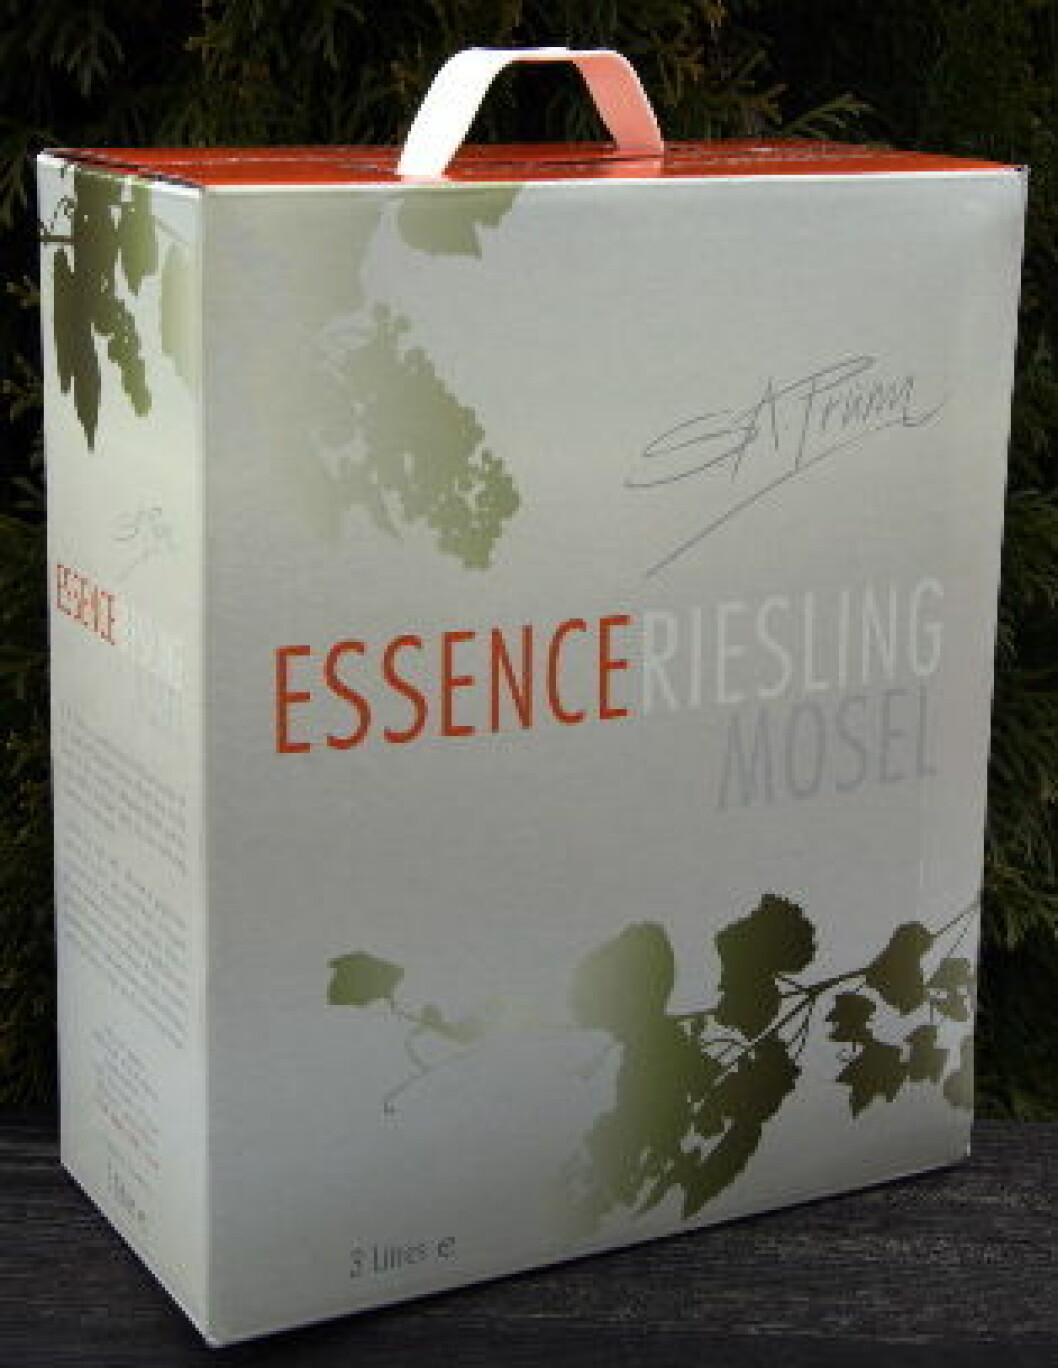 Essence Riesling (9)b nett